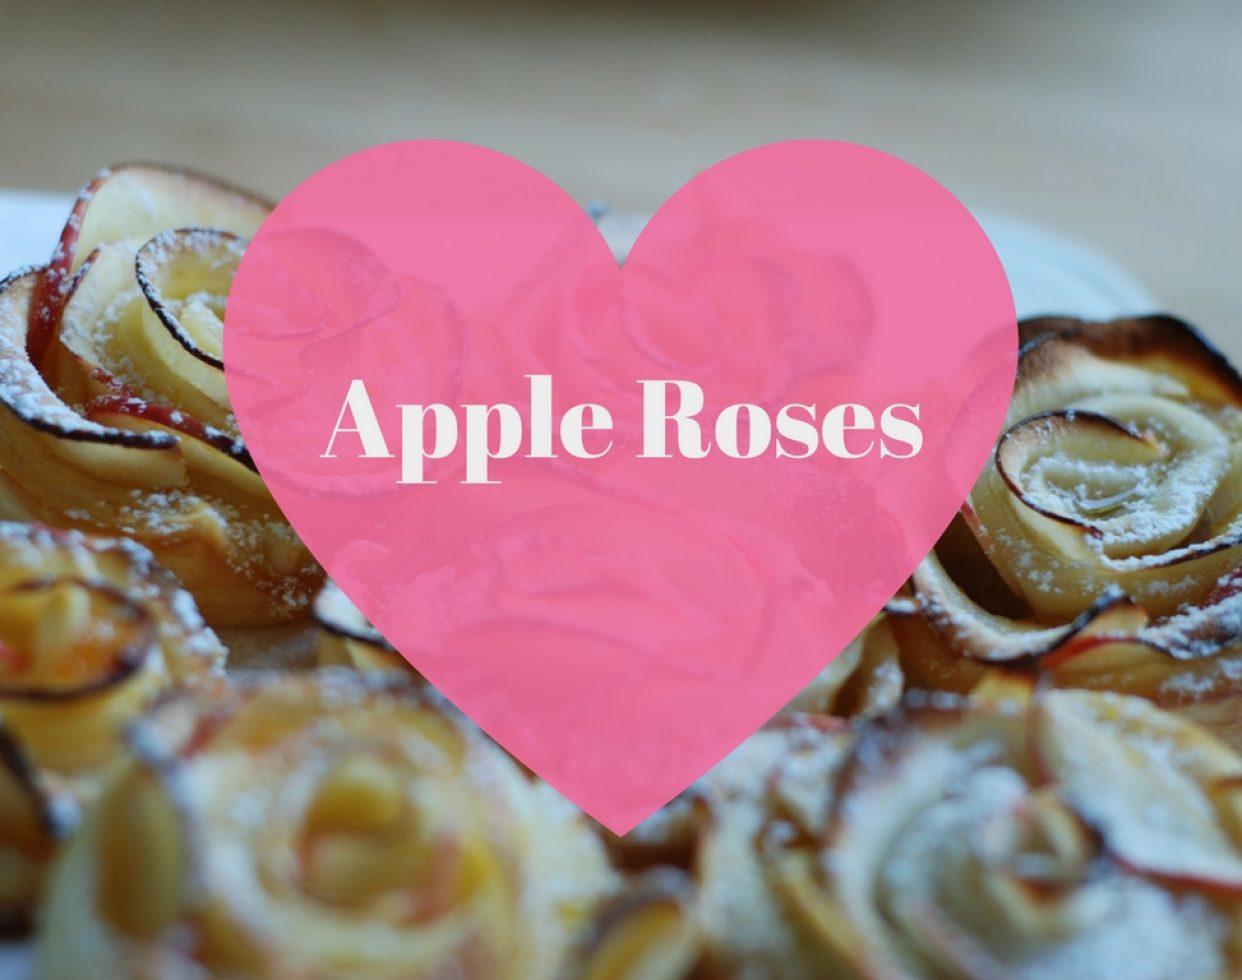 What you'll need: puff pastry sheet, all-purpose flour, red delicious apples, lemon, apricot preserves, cinnamon sugar,  powdered sugar, rolling pin and a cupcake baking pan.  (Photo: shokotov // pixabay)